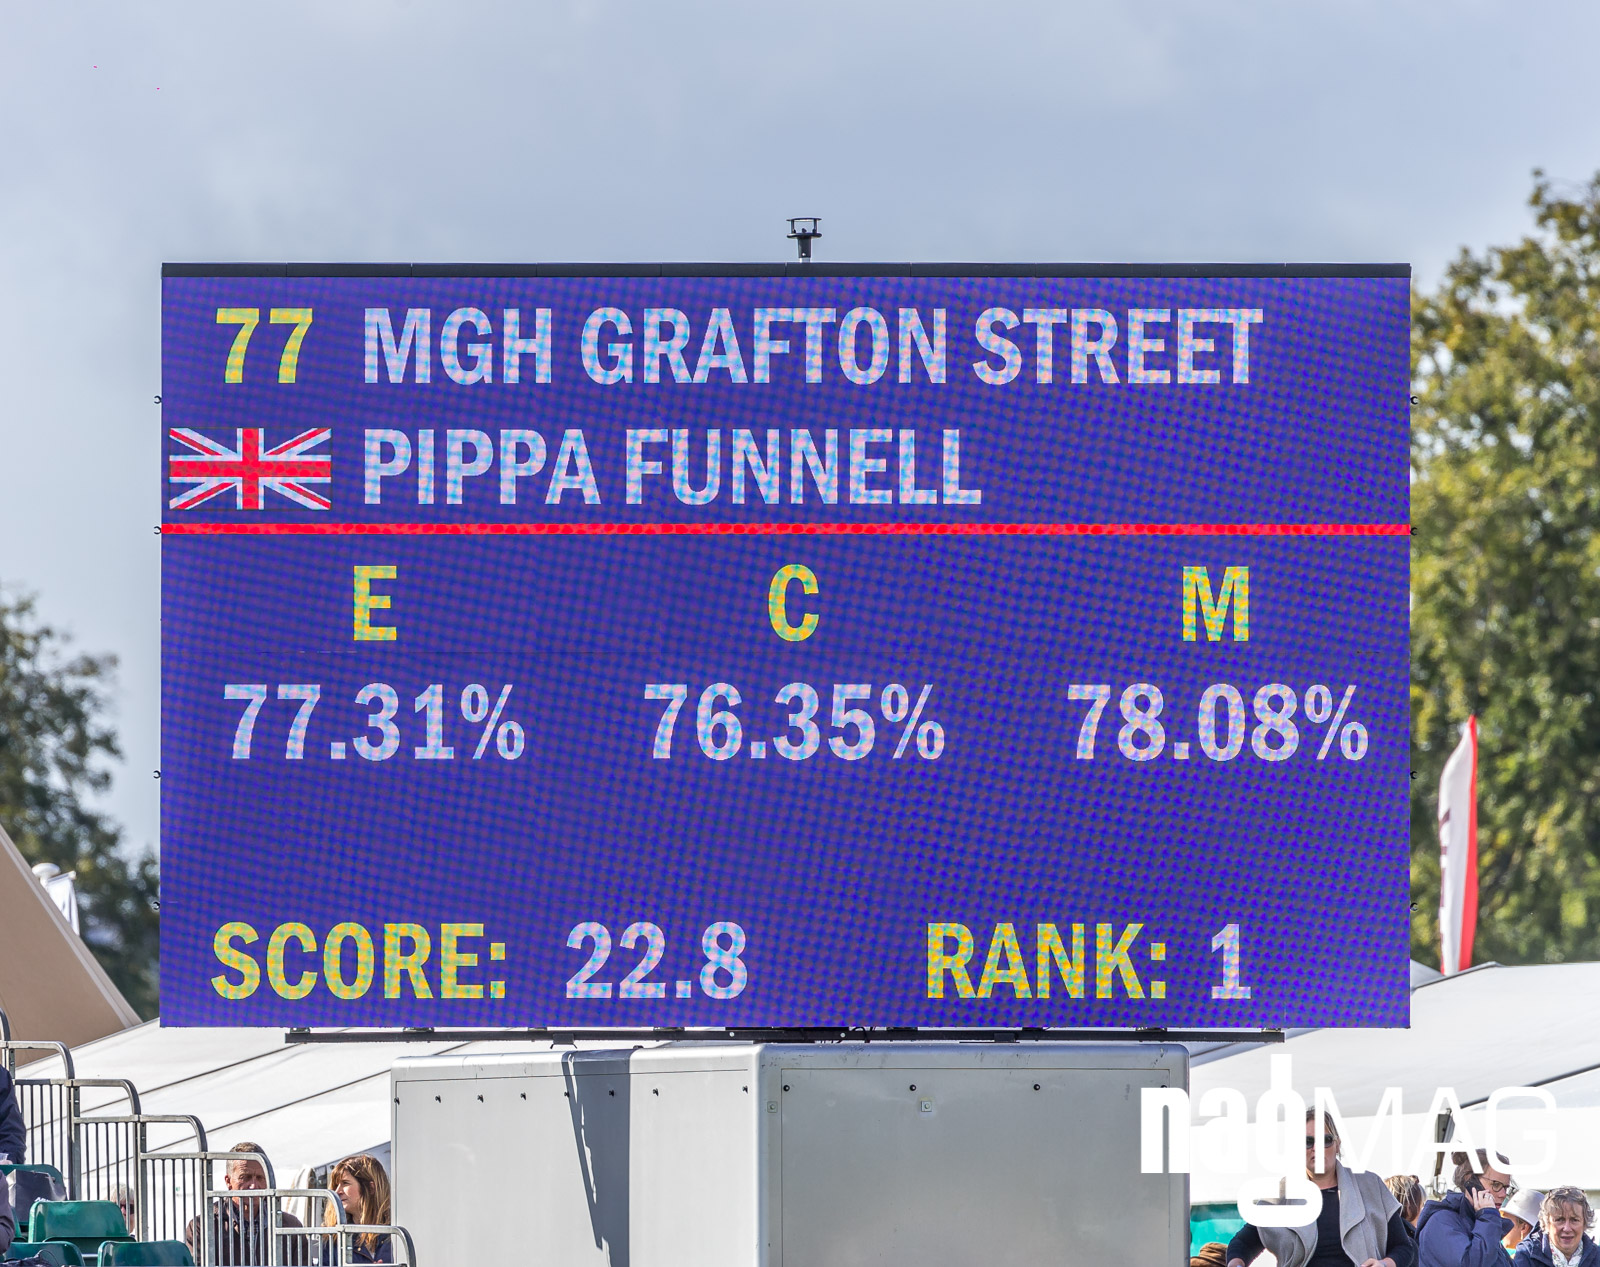 Pippa Funnell on MGH GRAFTON STREET